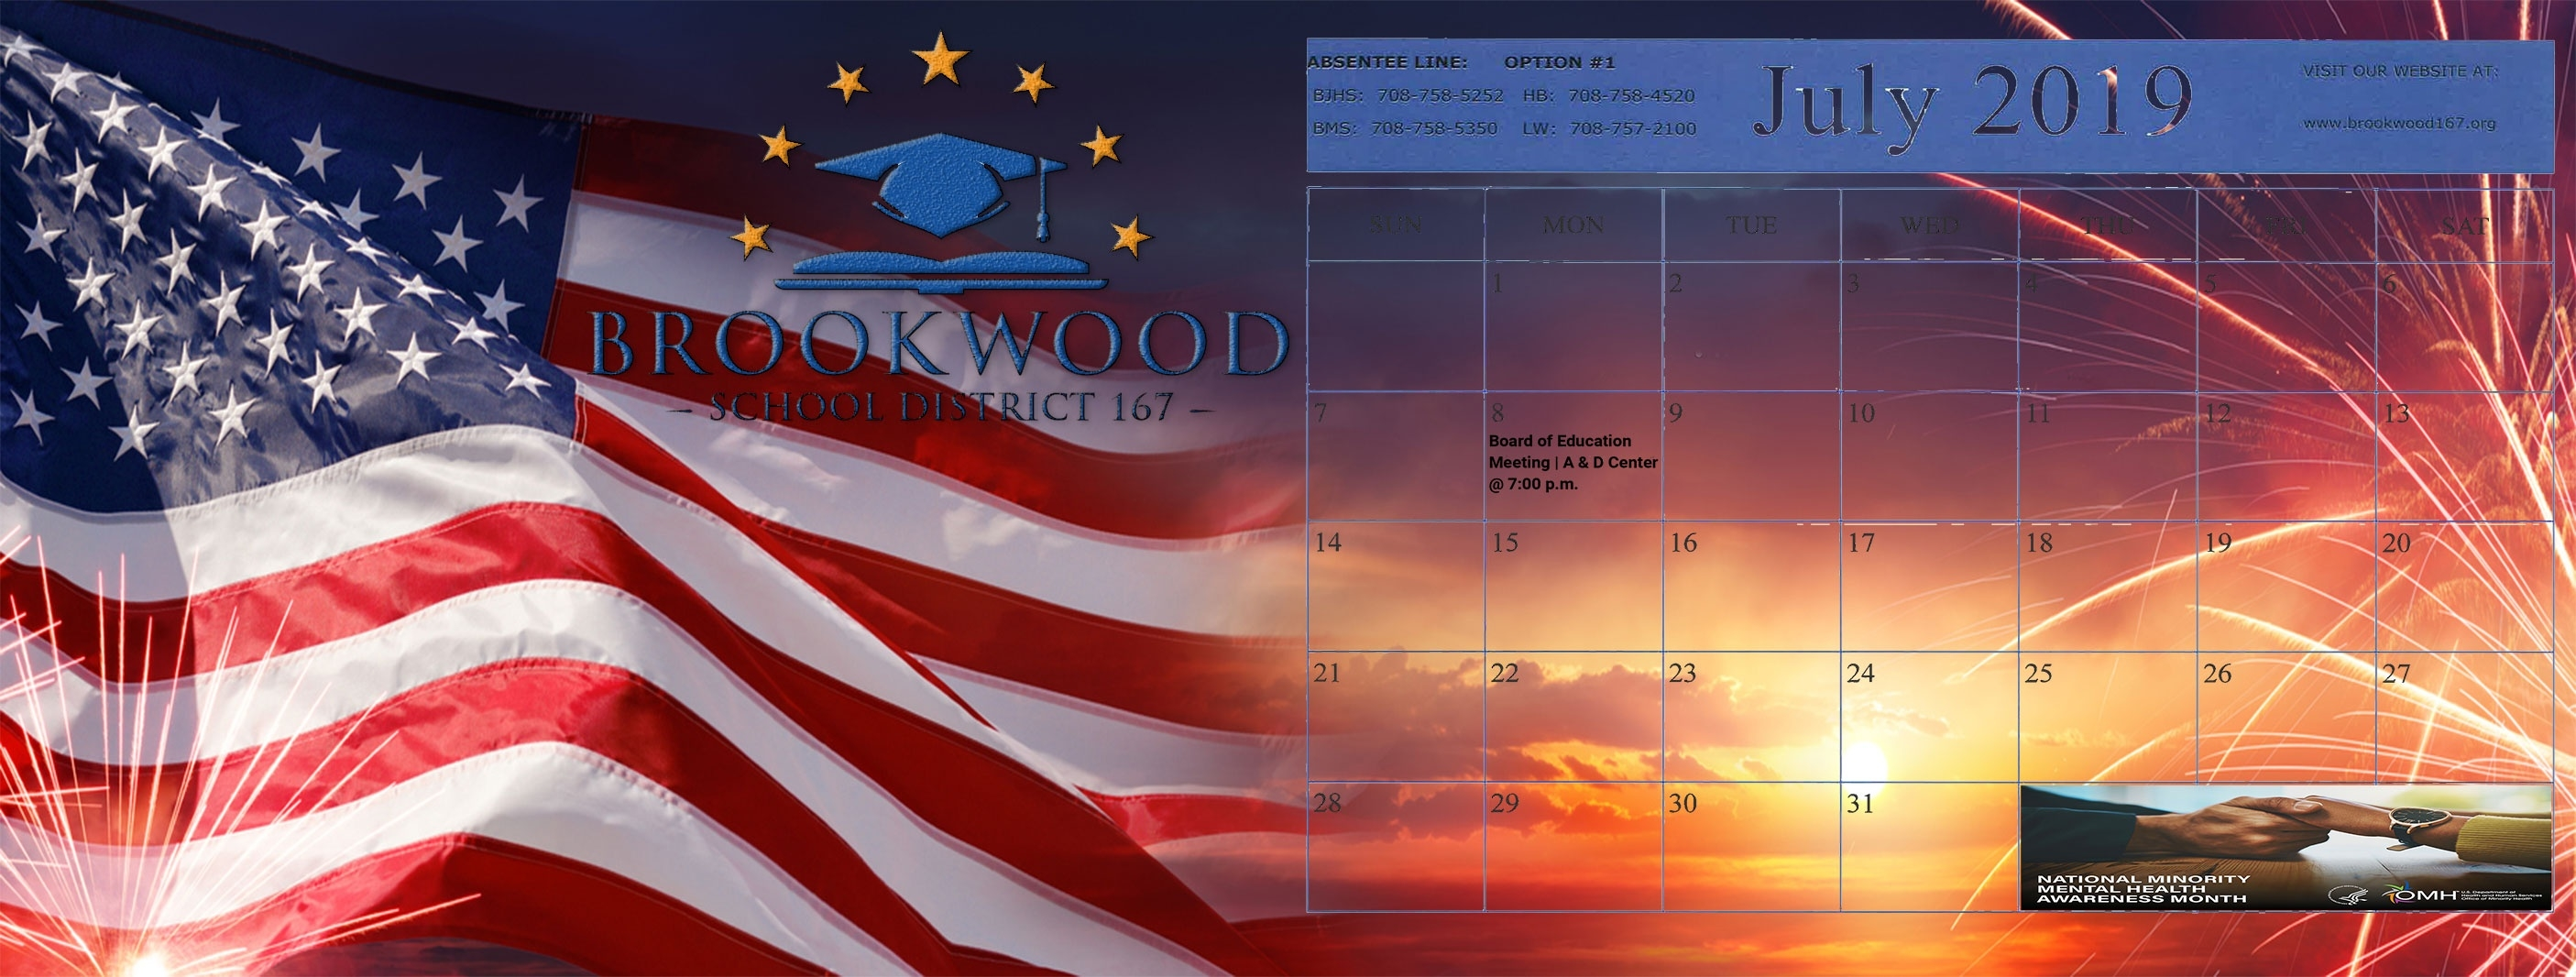 Brookwood School District 167 – Brookwood School District 167_157 C School Calendar